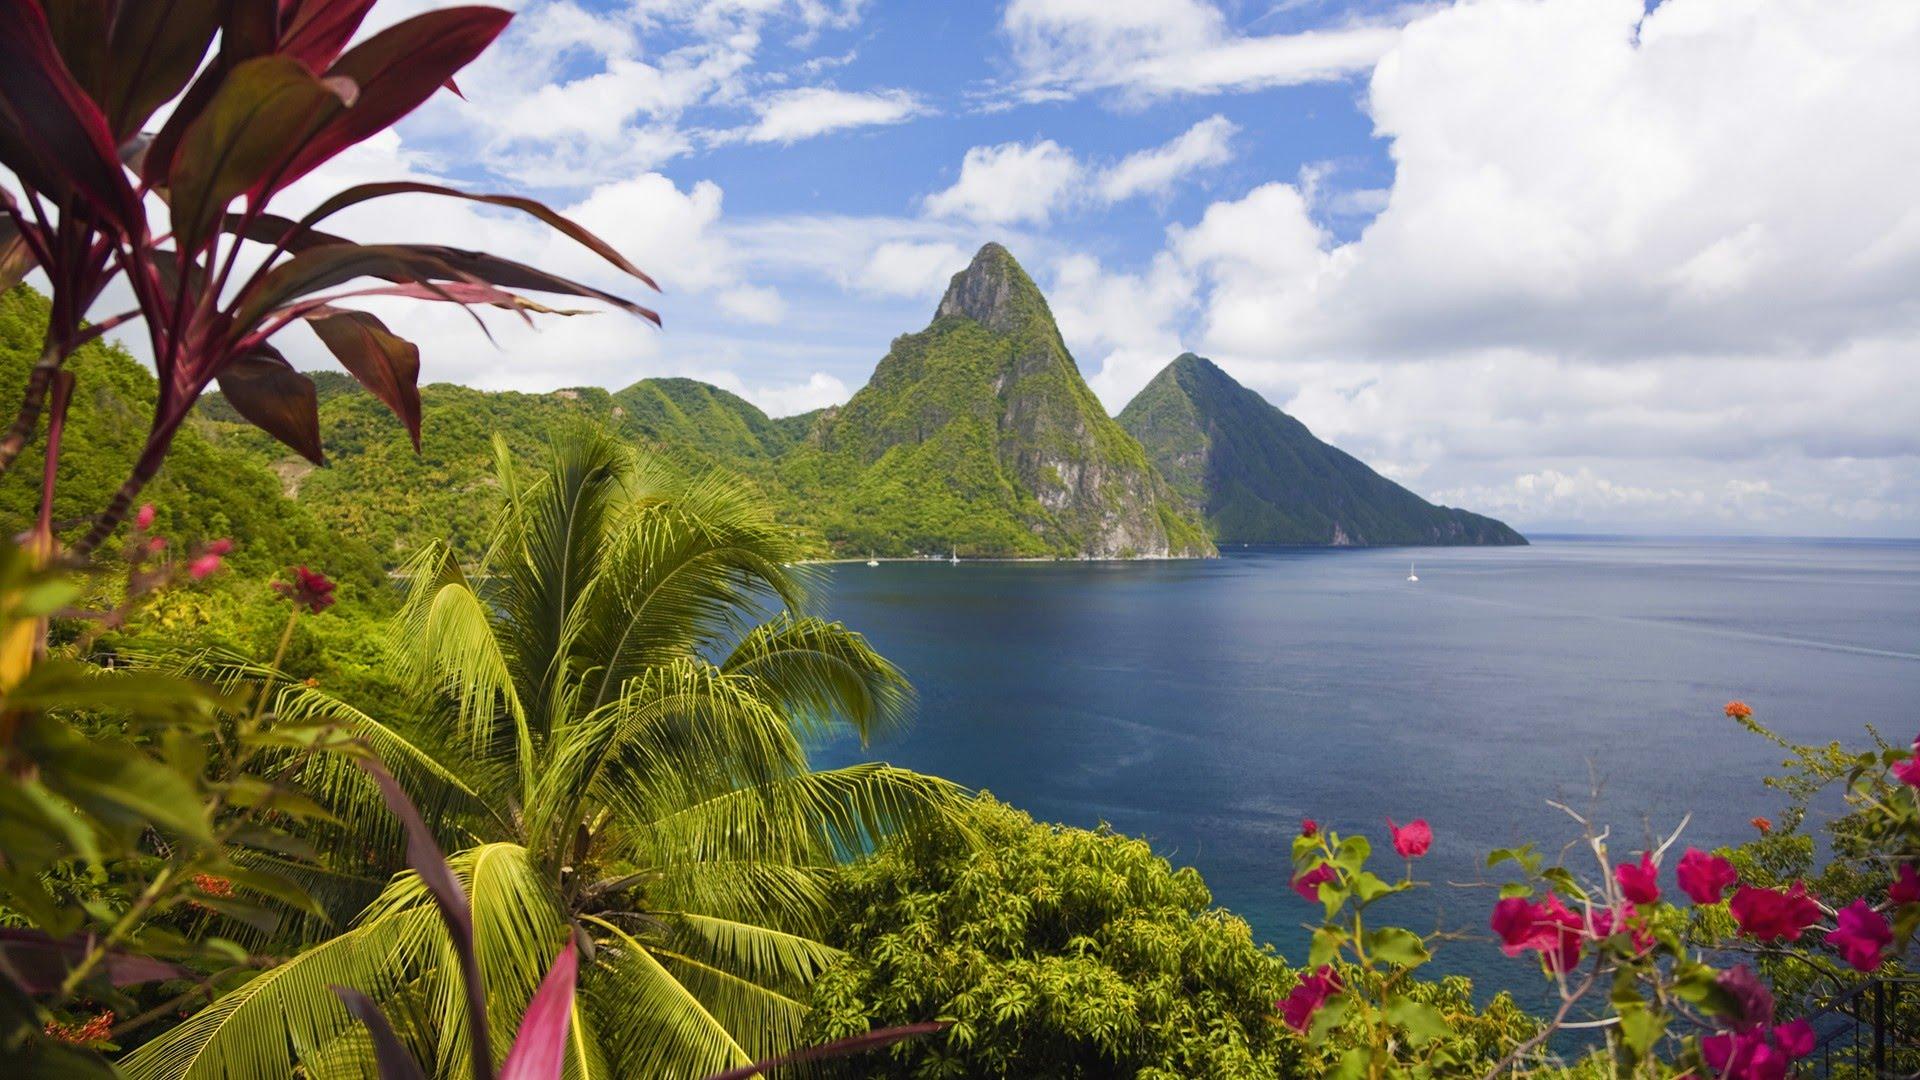 St. Lucia Background Saint Lucia – The Diamond of The Caribbean